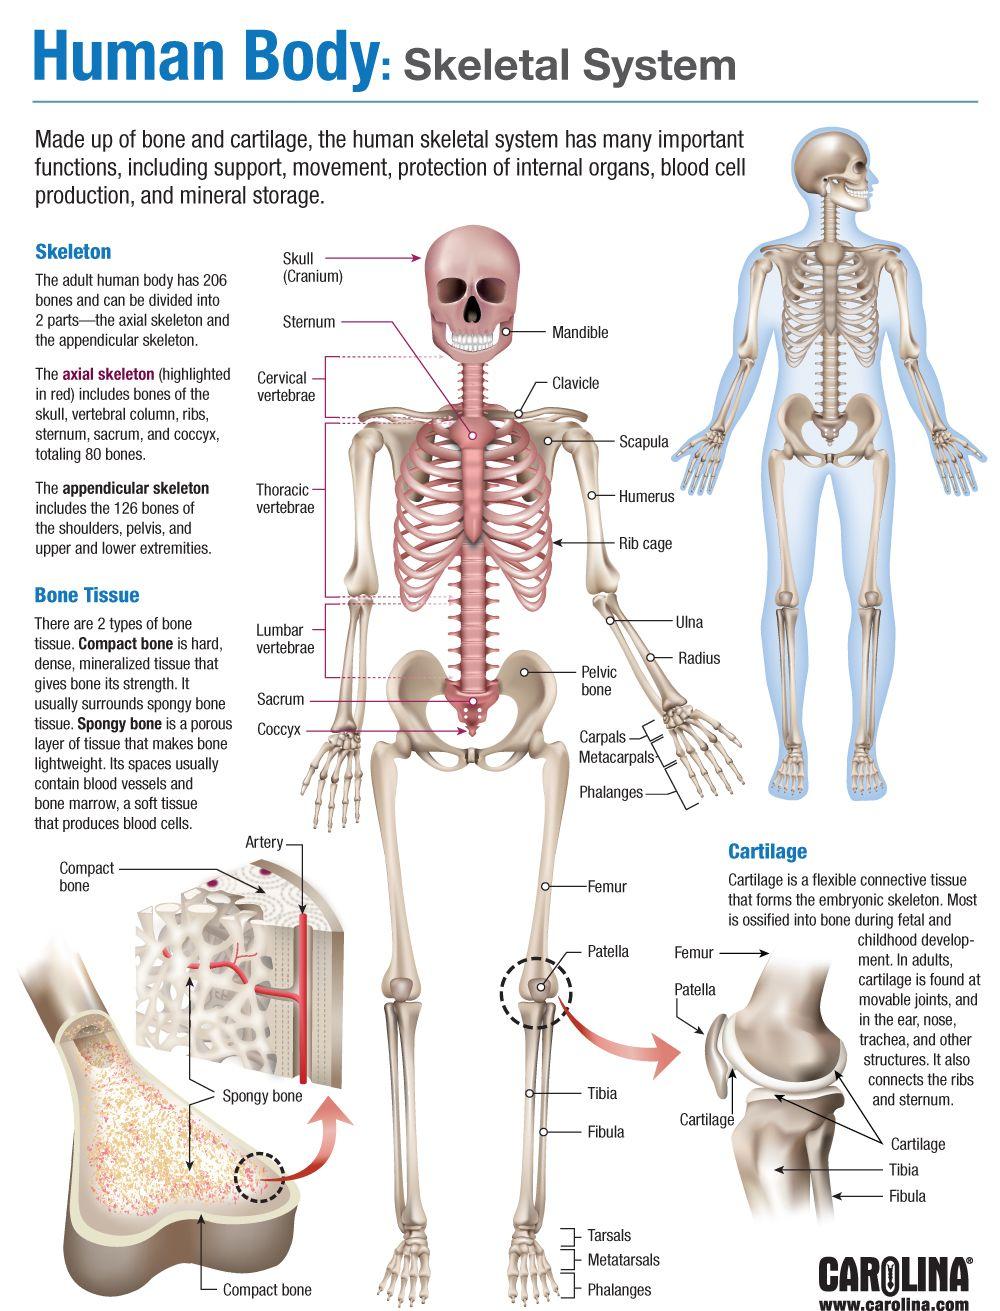 Human Skeletal System Dinocrofo